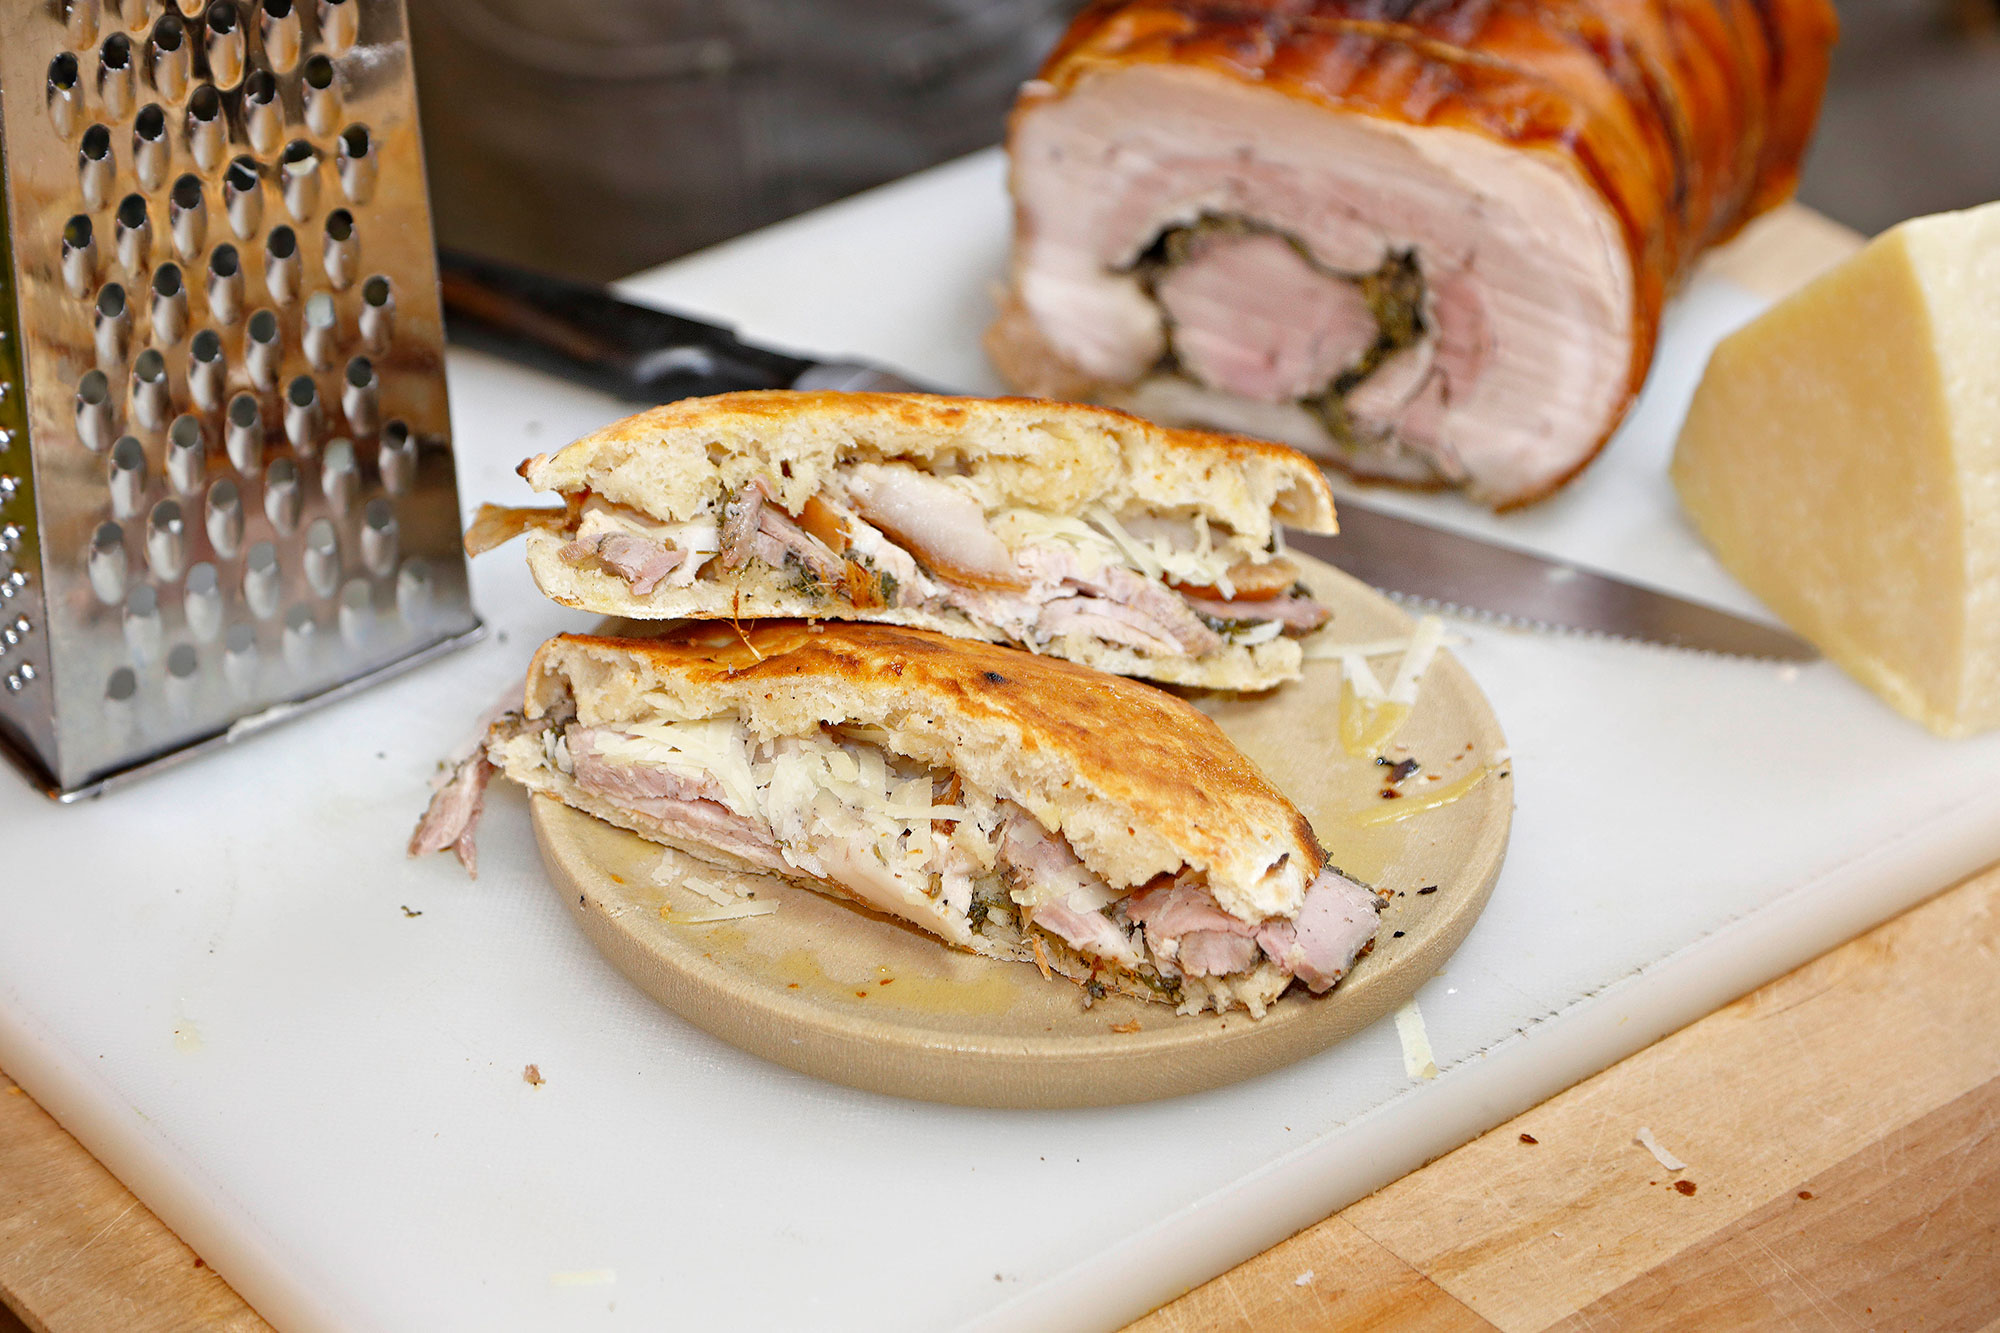 Aquí la 'porchetta' se toma en ración, en 'pucia' (un bocadillo de pan crujiente que asan aquí mismo) o en 'bruschetta'.